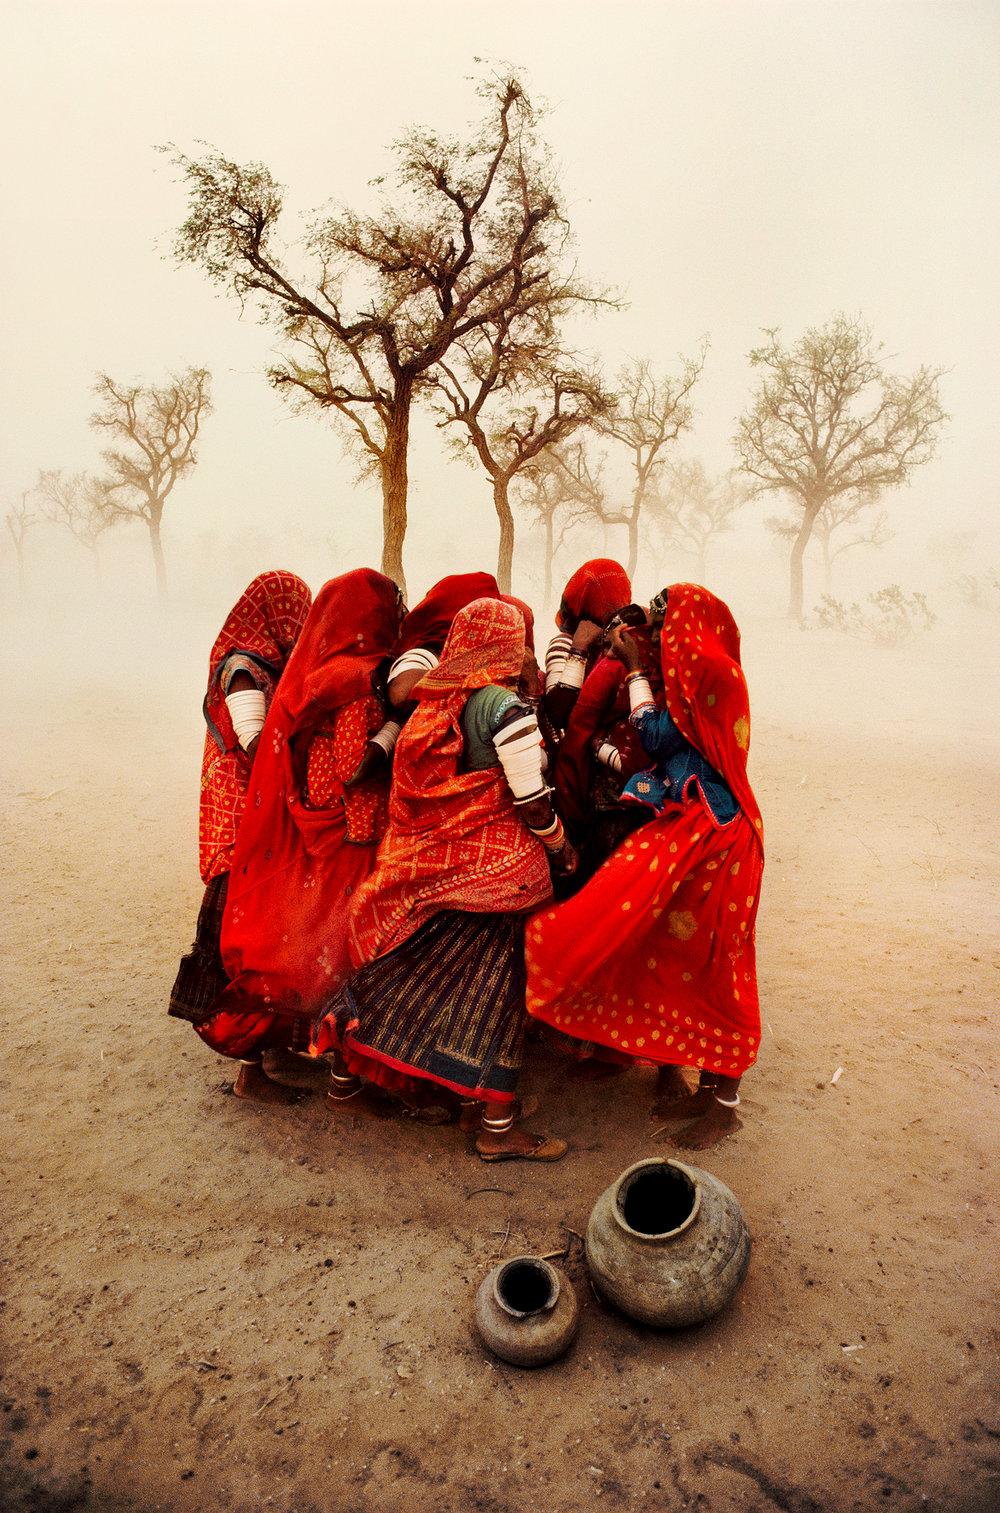 Rajasthan, India, 1983. ©Steve McCurry